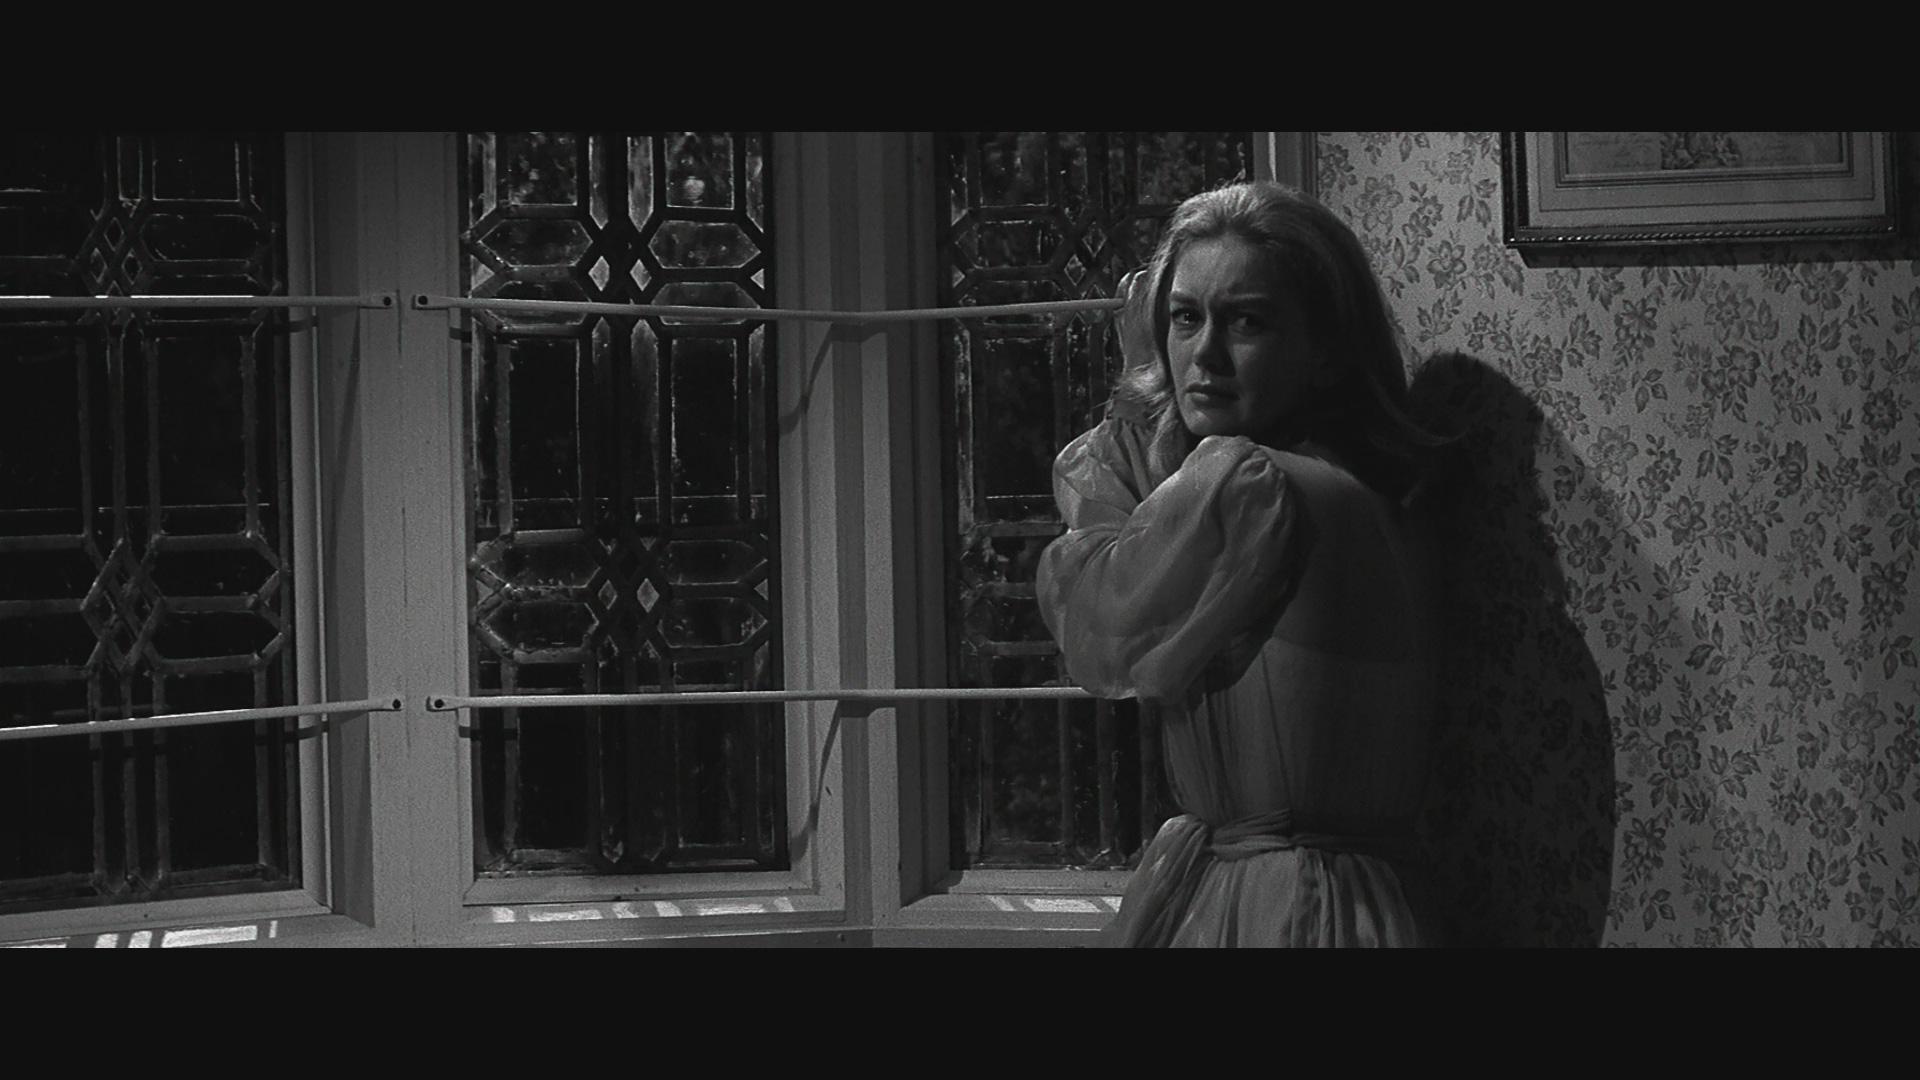 Janette Scott in Paranoiac (1963)